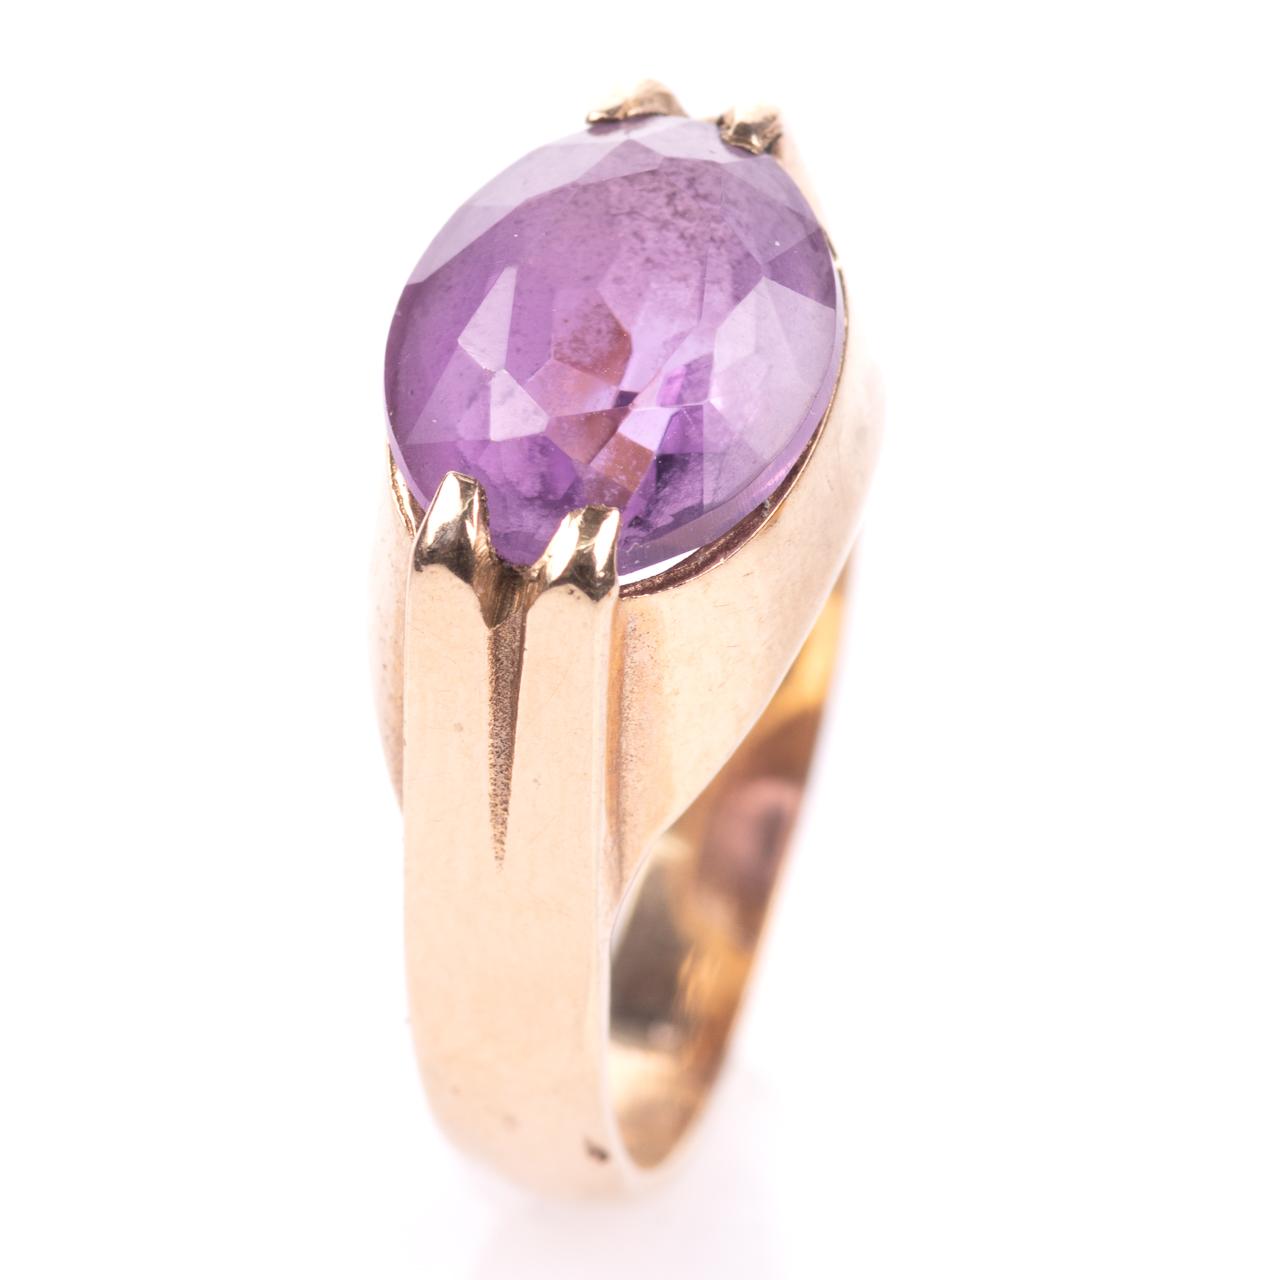 9ct Gold 3.20ct Amethyst Ring